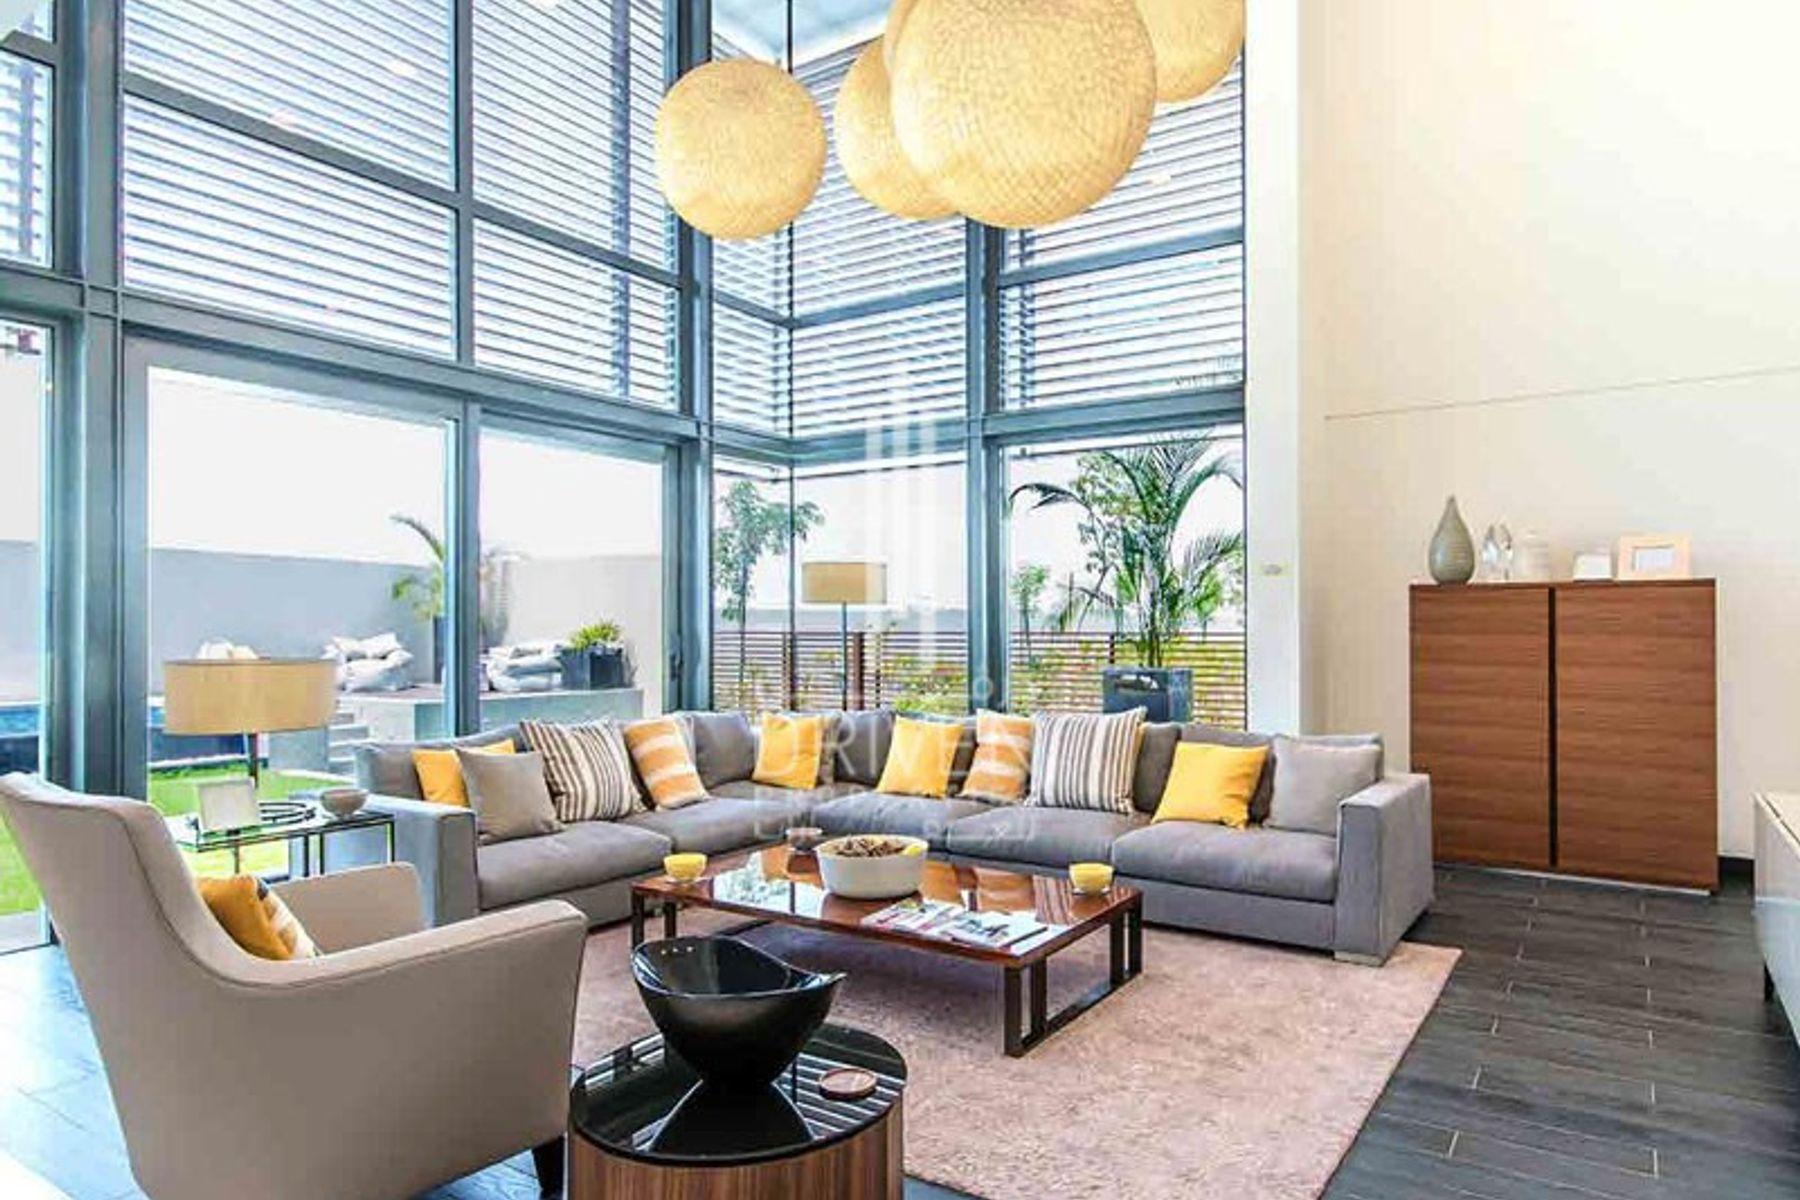 Villa for Sale in The Hartland Villas - Mohammed Bin Rashid City